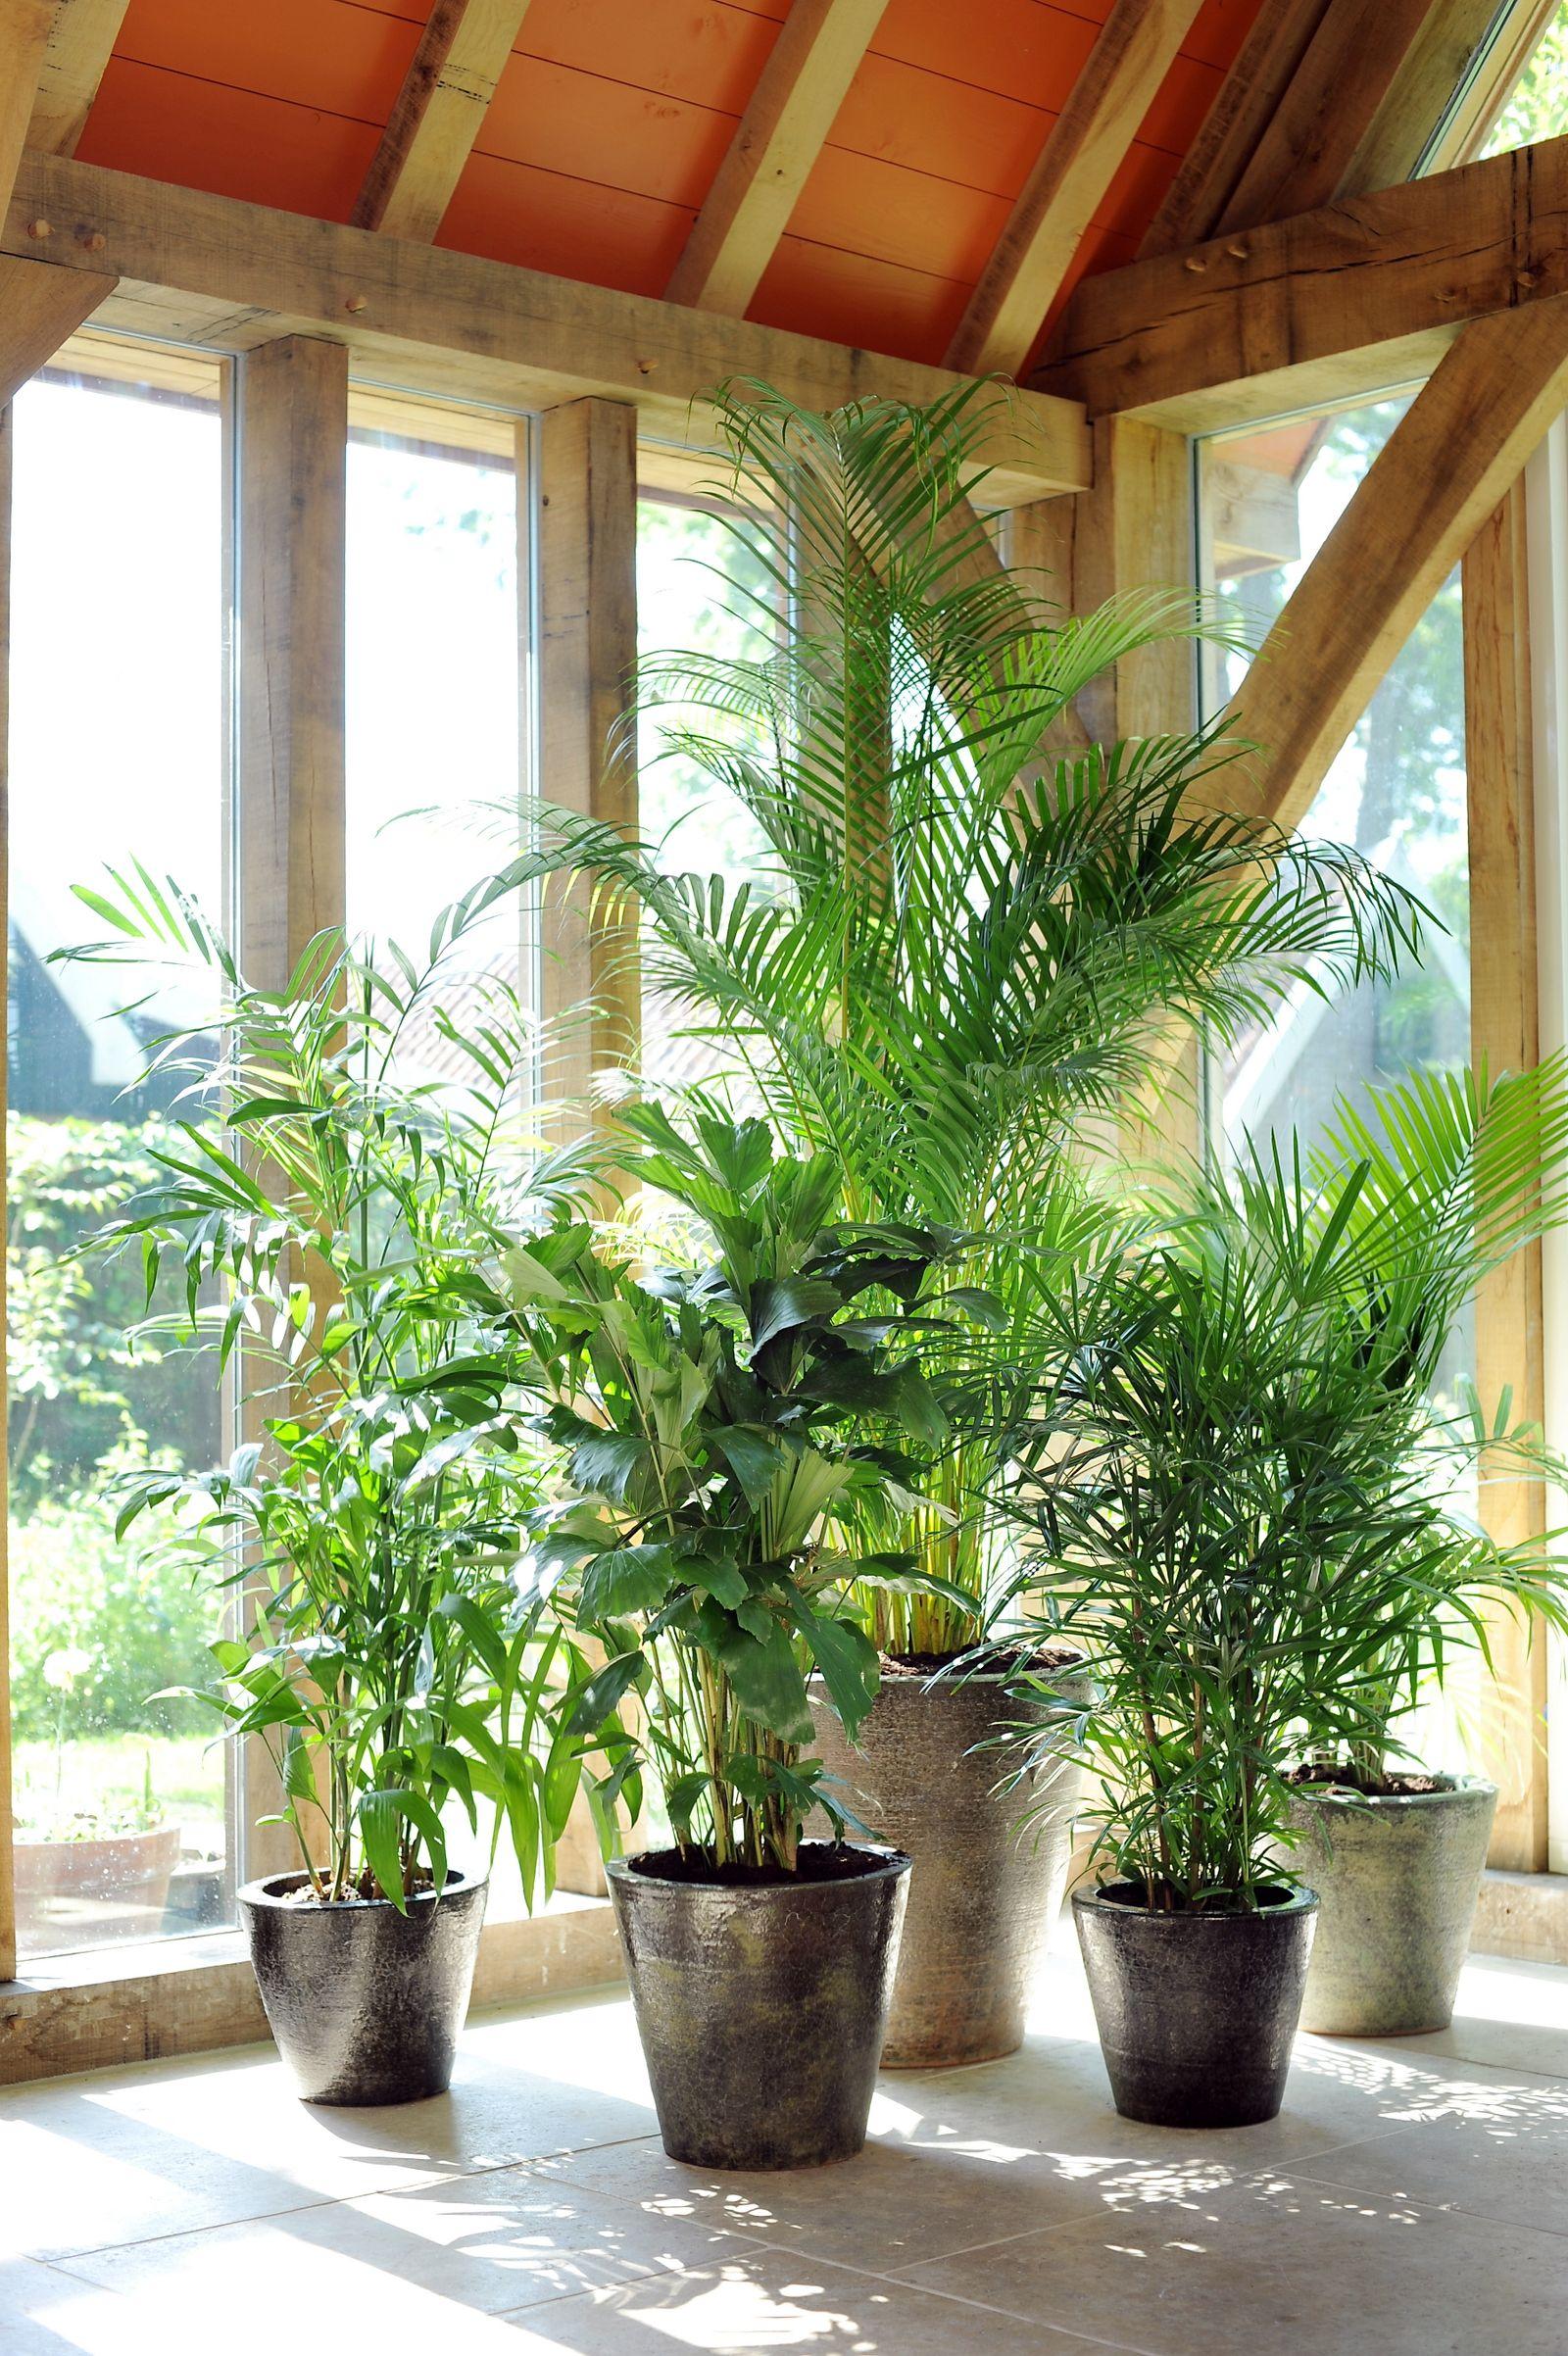 Pflanze / Zimmerpflanze / Palme